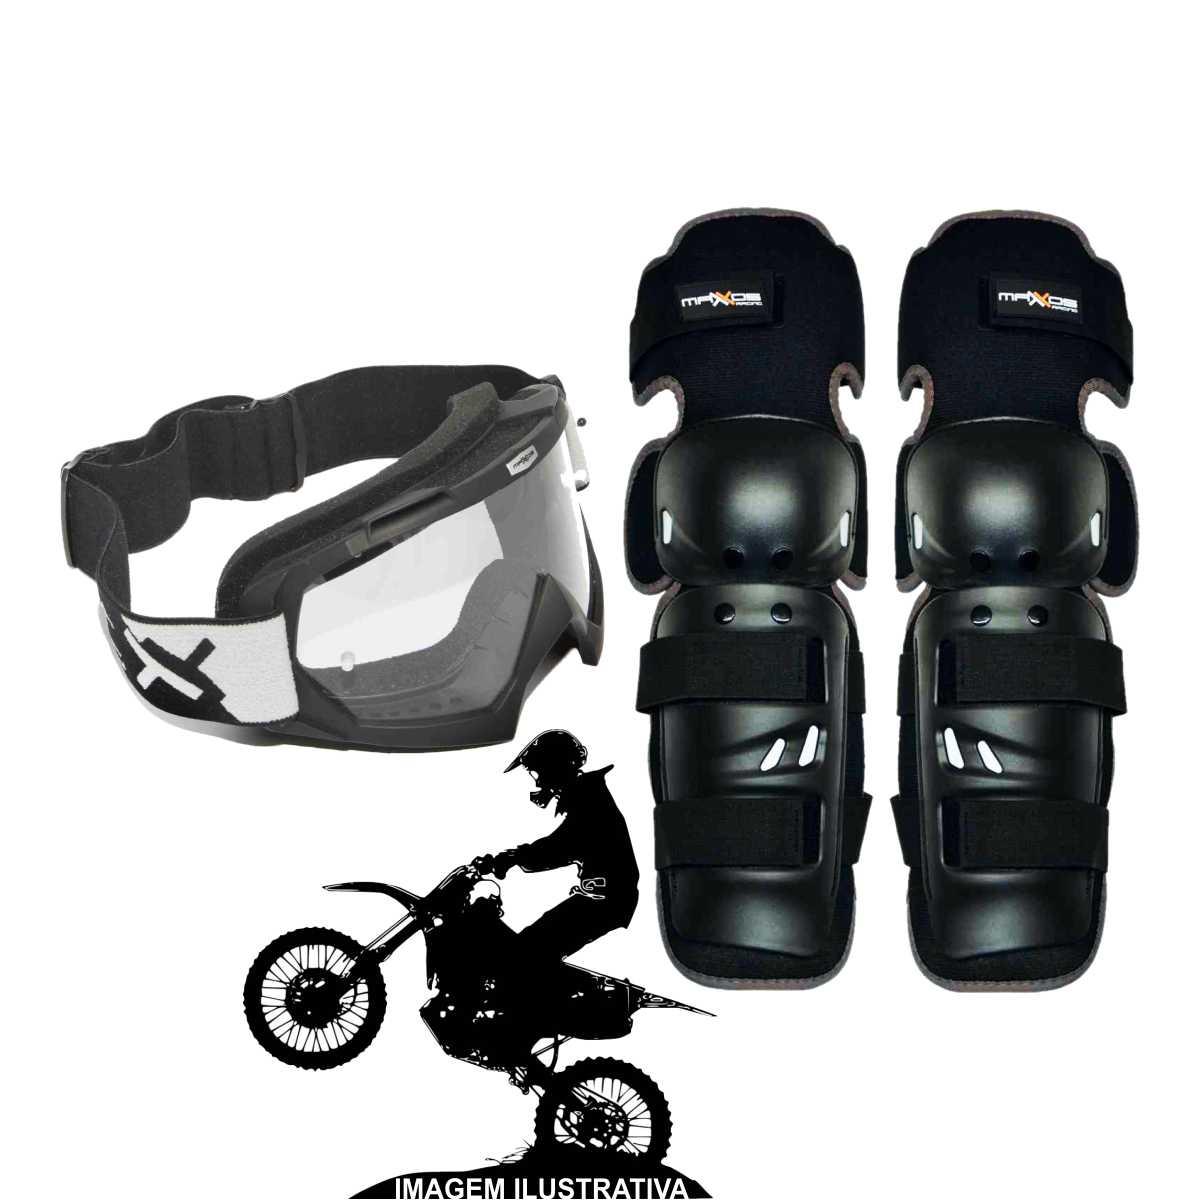 KIT JOELHEIRA DE MOTOCROSS MATTOS RACING MX1 PRETO + ÓCULOS COMBAT TRILHA OFF-ROAD LENTE CRISTAL